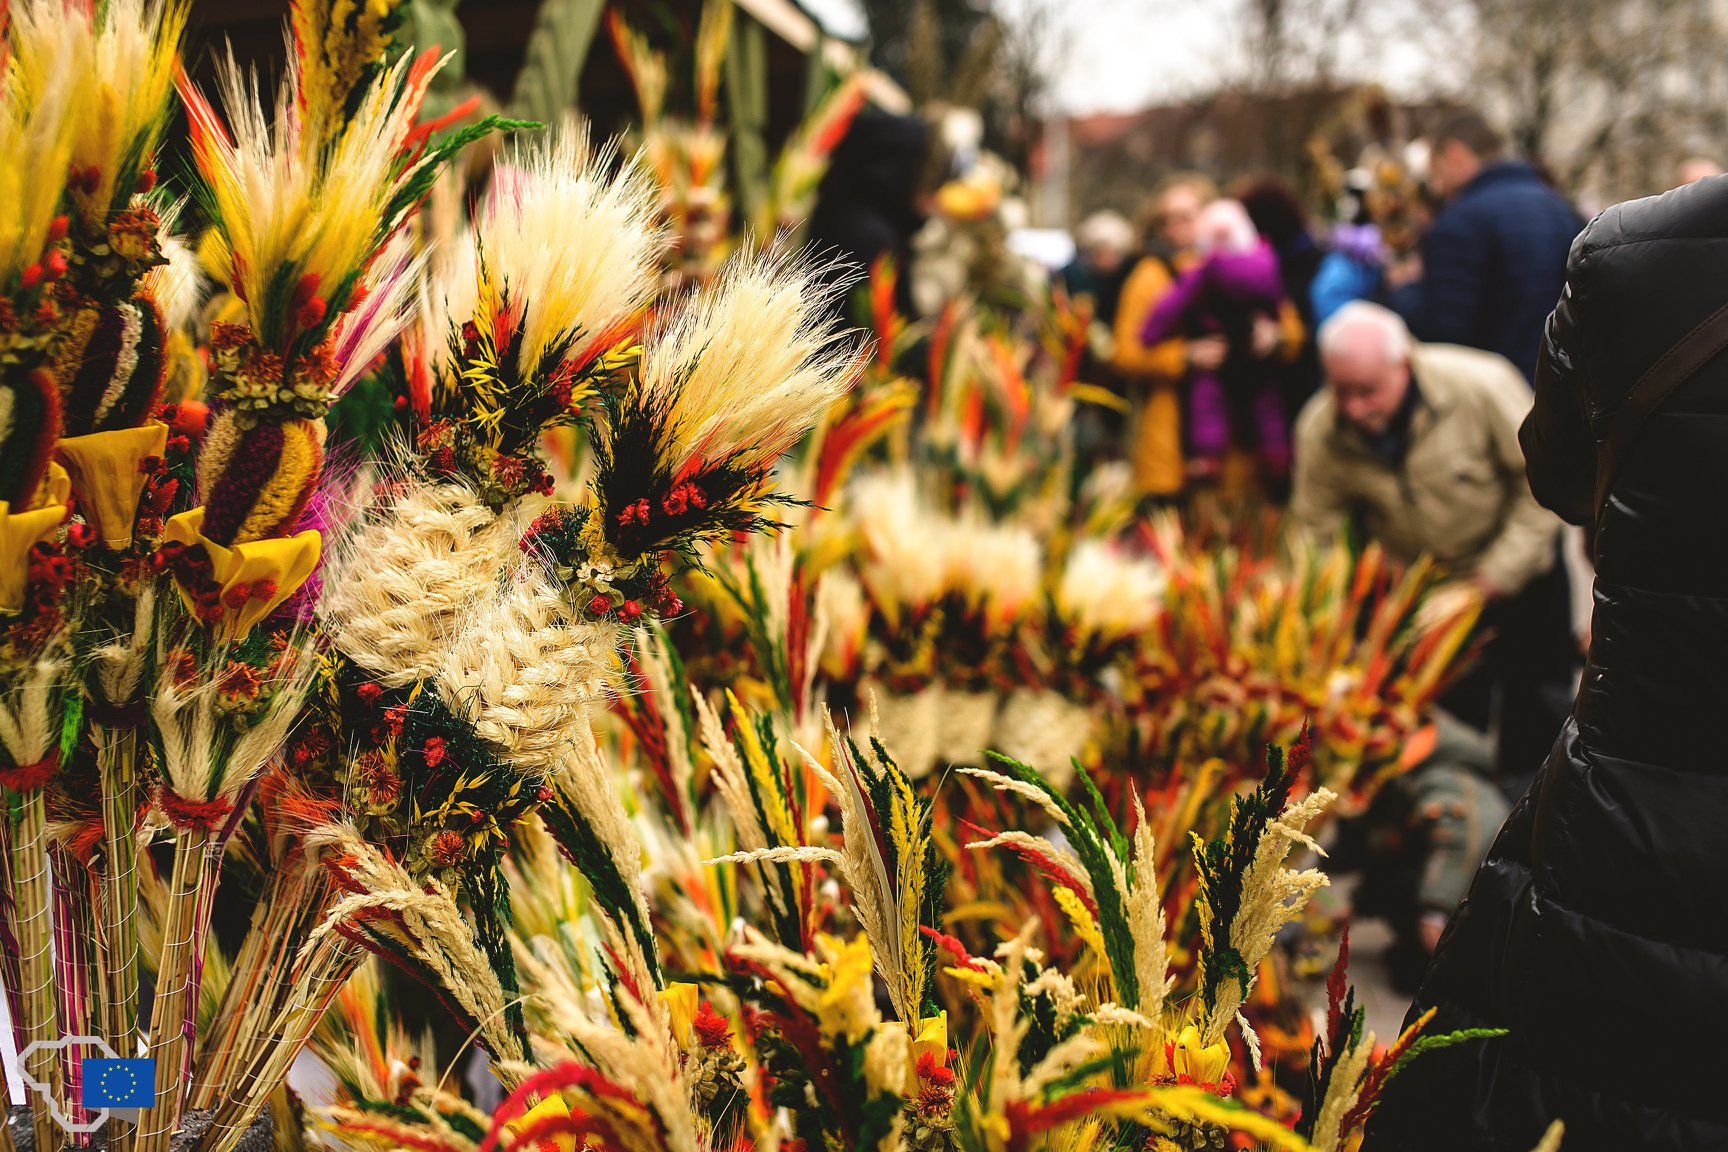 Easter dried flower bouquet at Kaziukas fair in Vilnius